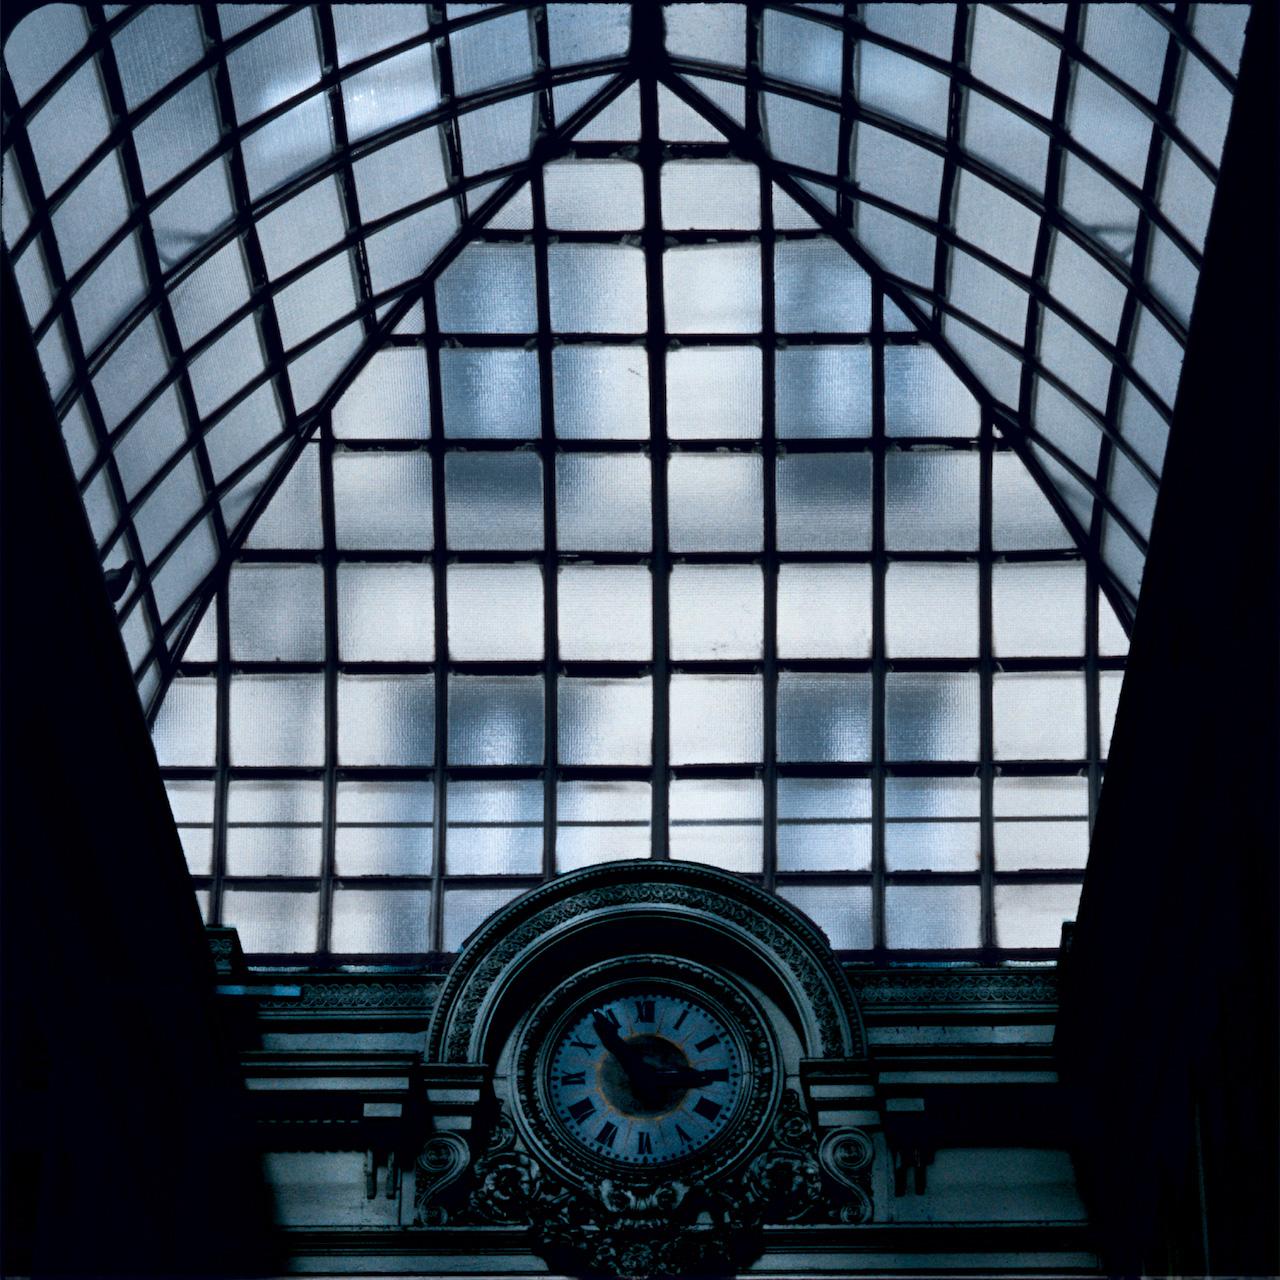 Glass: Clock (Paris) 2002 Druckfläche 83cm x 83 cm  Gerahmt 120 h x 118 b Limitierte Auflage von 8 Artist Proof (AP)  Epreuve D'Artist   Euro 3.400 gerahmt Archival Ink Print; Sommerset Fine Art Papier